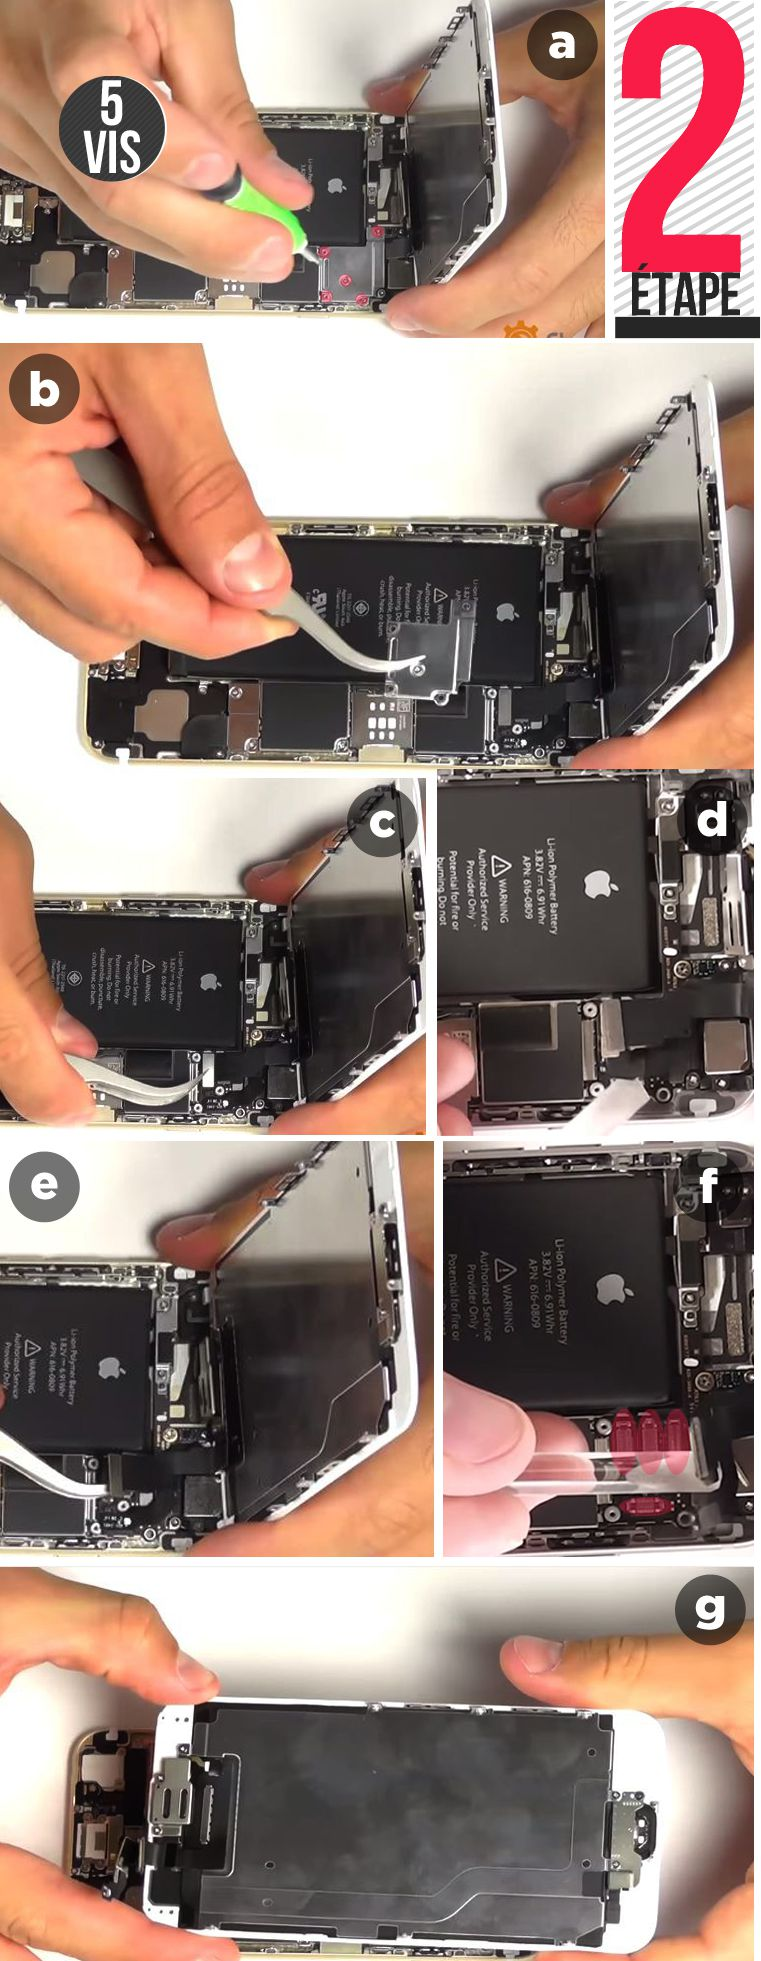 tutoriel_remplacement_camera_arriere_iphone_6_etape2